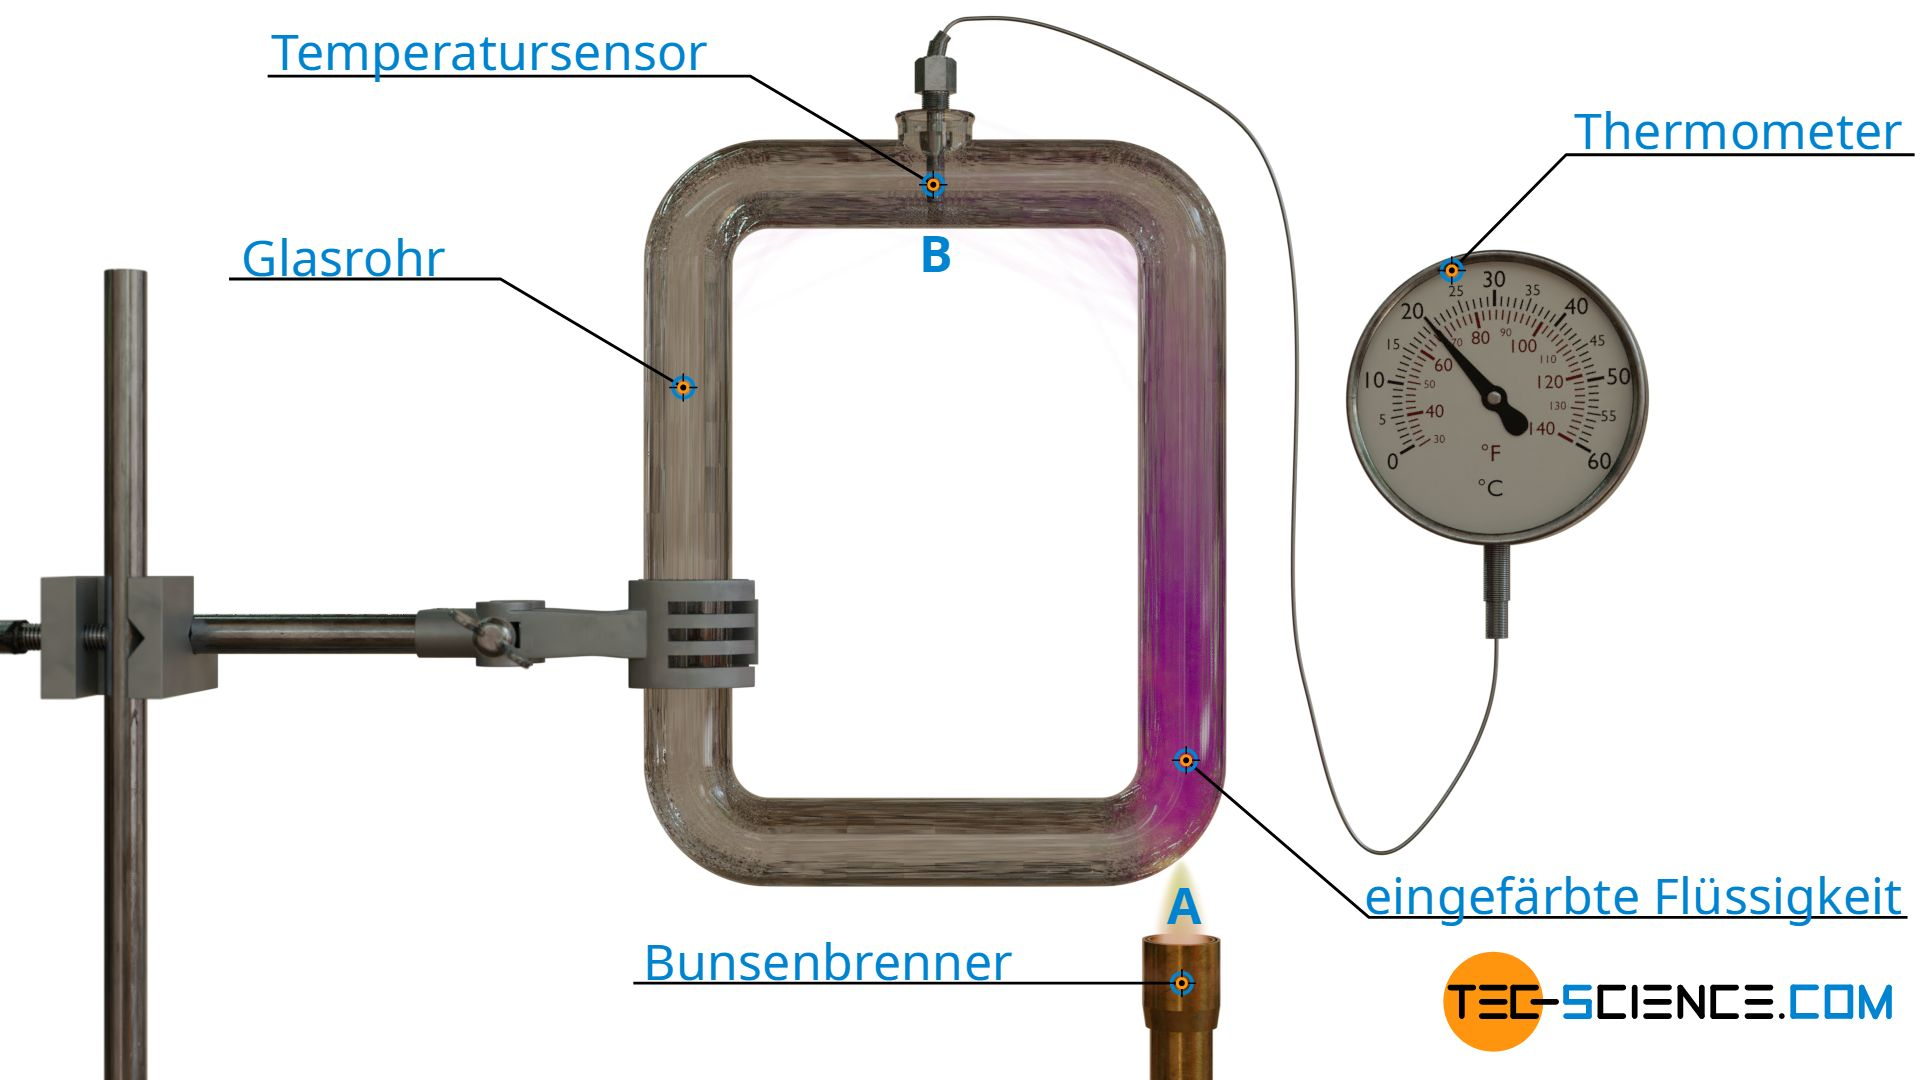 Experiment zur Demonstration des Wärmetransports durch Wärmeströmung (Konvektion)